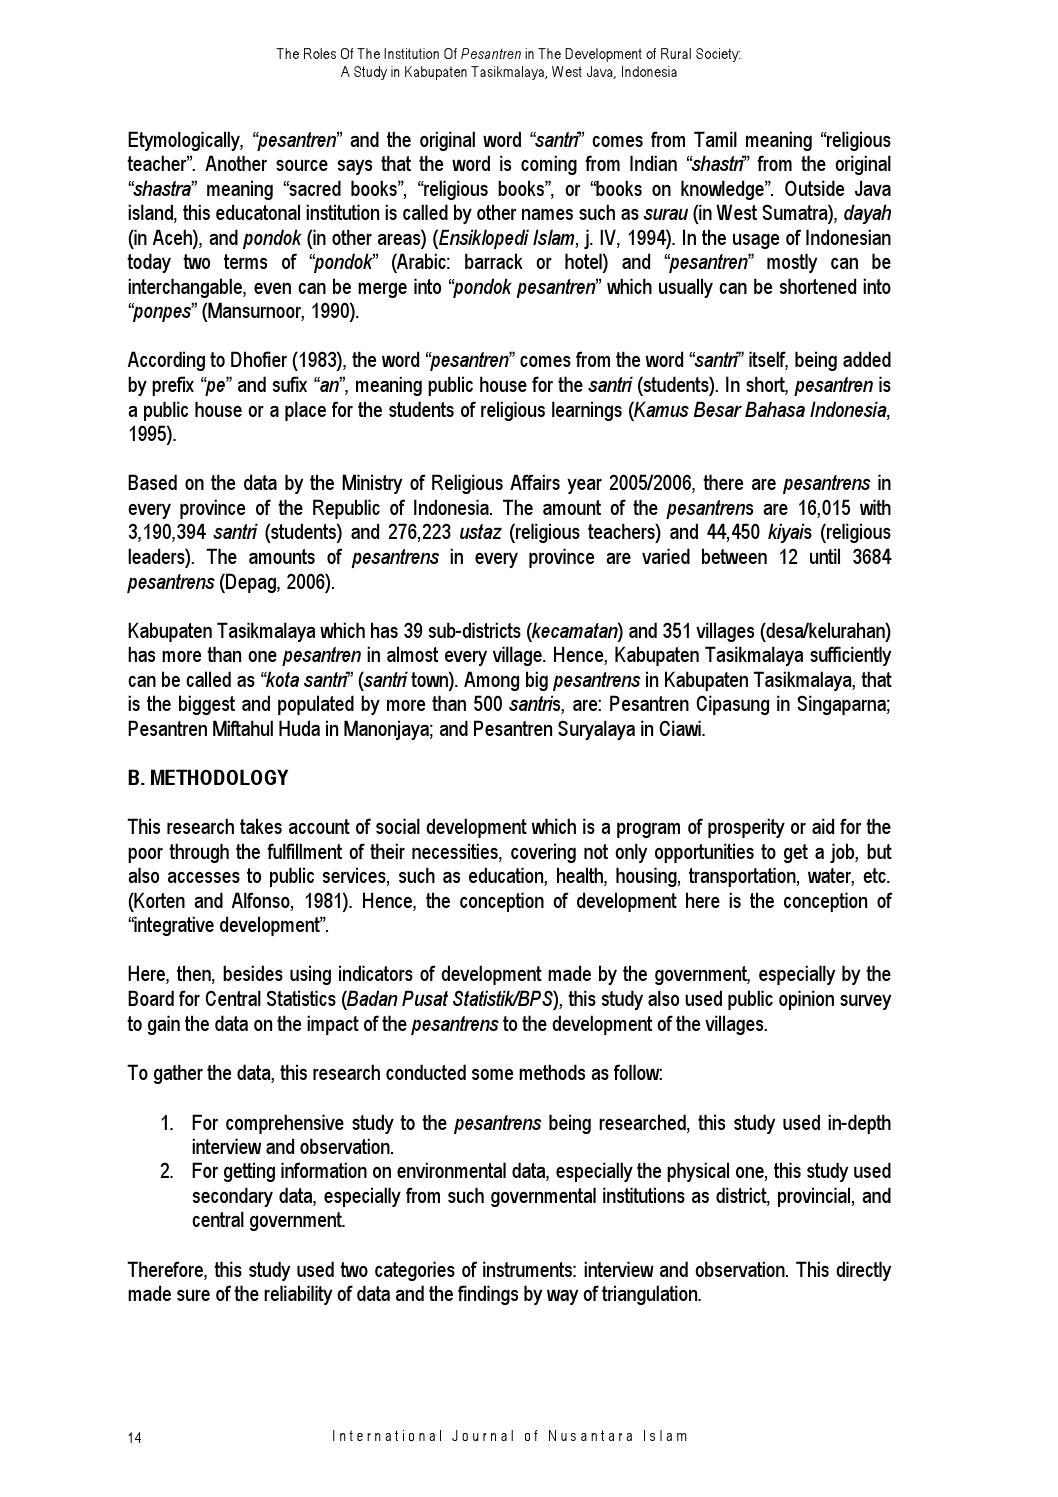 International Journal of Nusantara islam vol 01 no 01 by